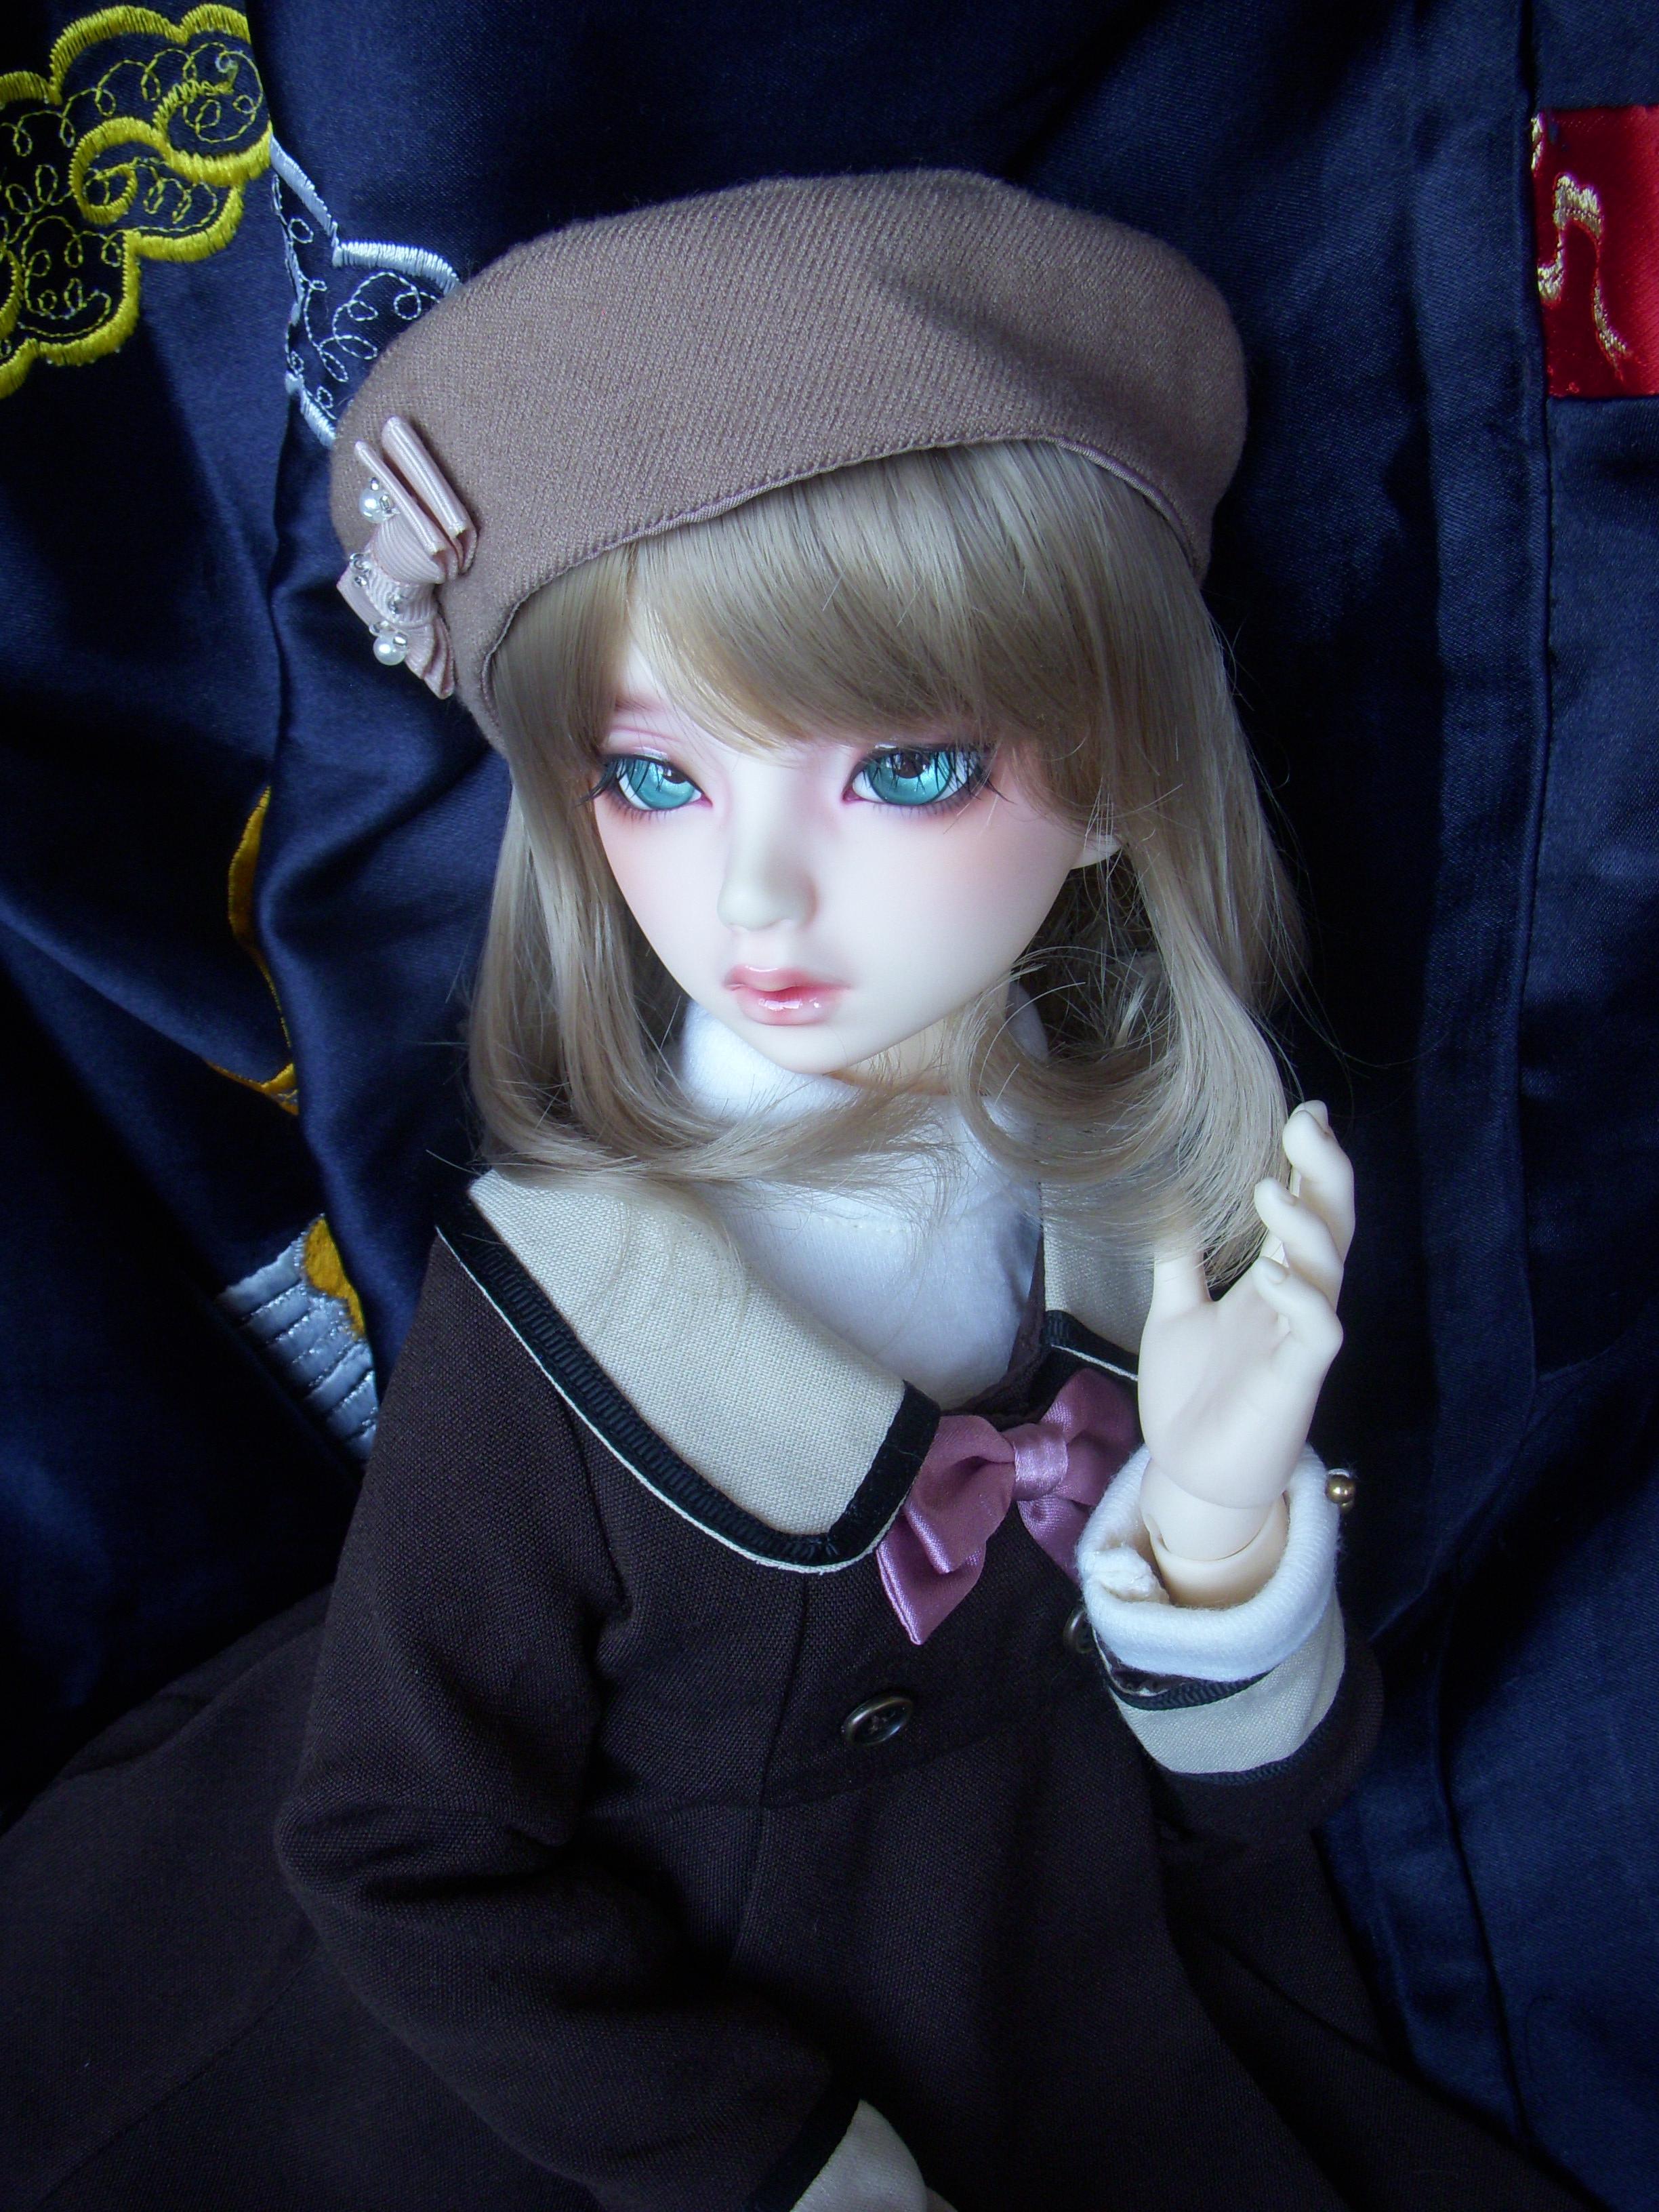 Originals for Tenshi no Mon (6)